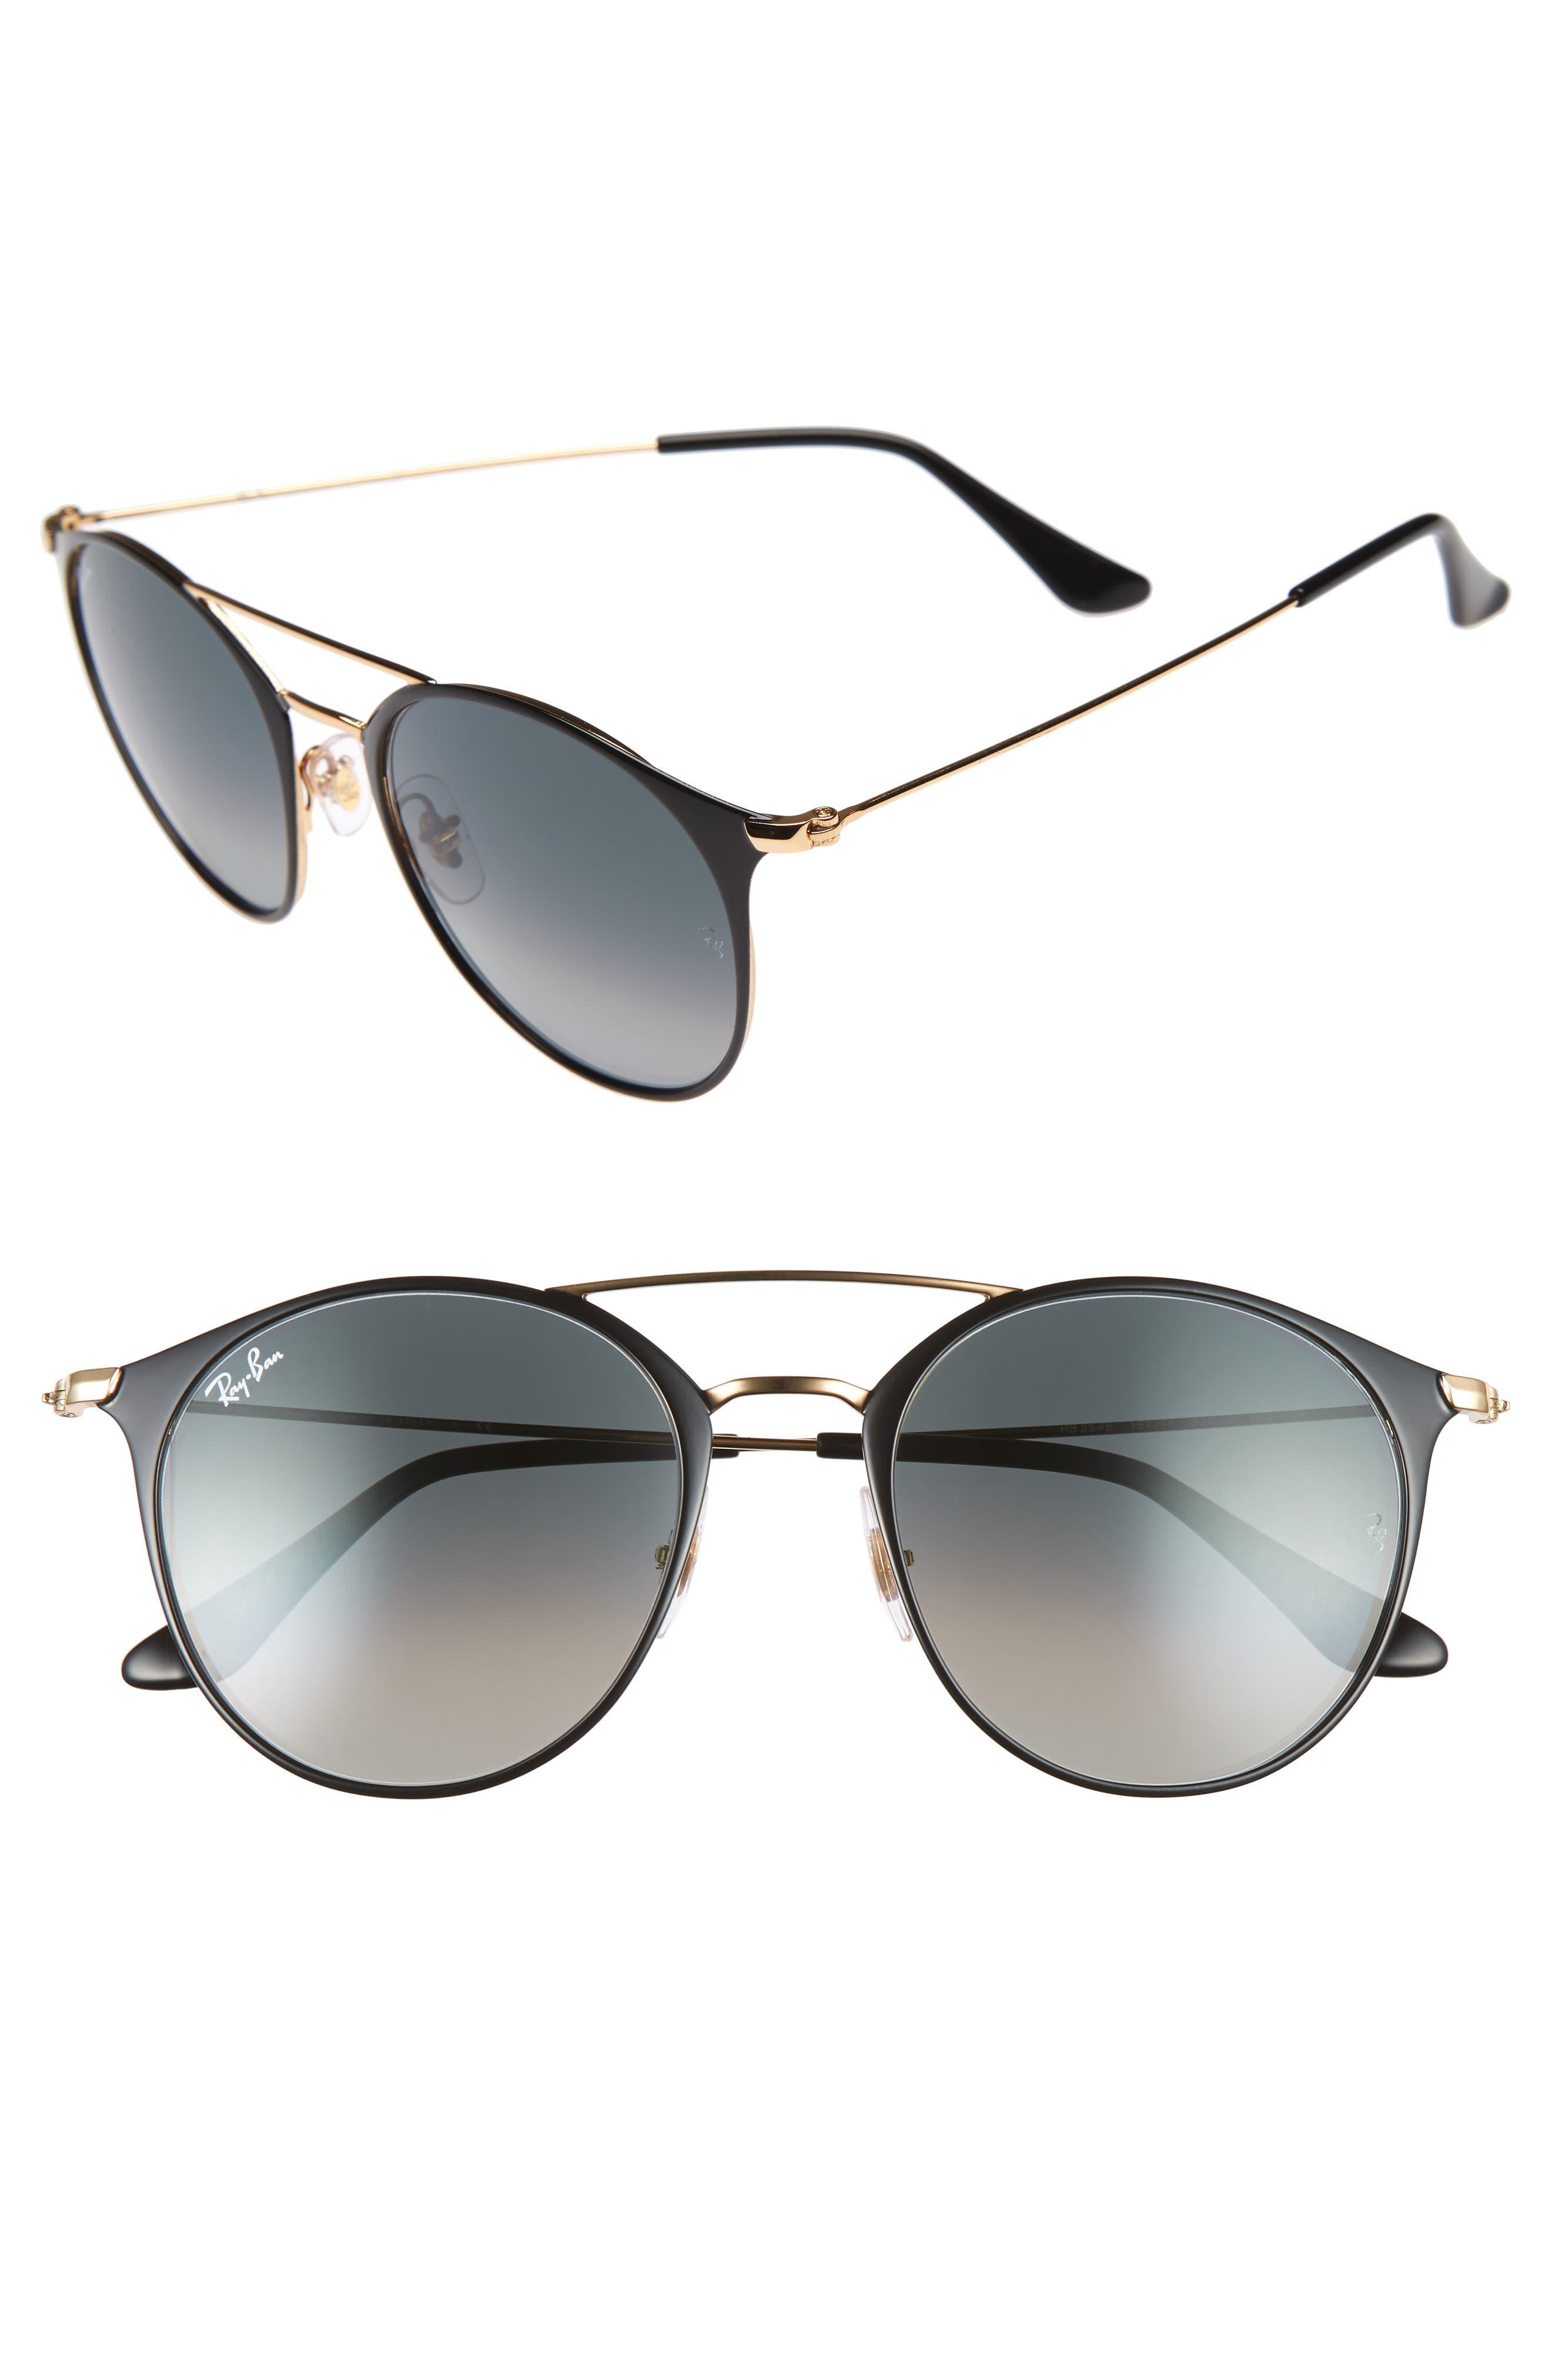 Highstreet 52mm Round Brow Bar Sunglasses, Main, color, BLACK/ GOLD/ GREY